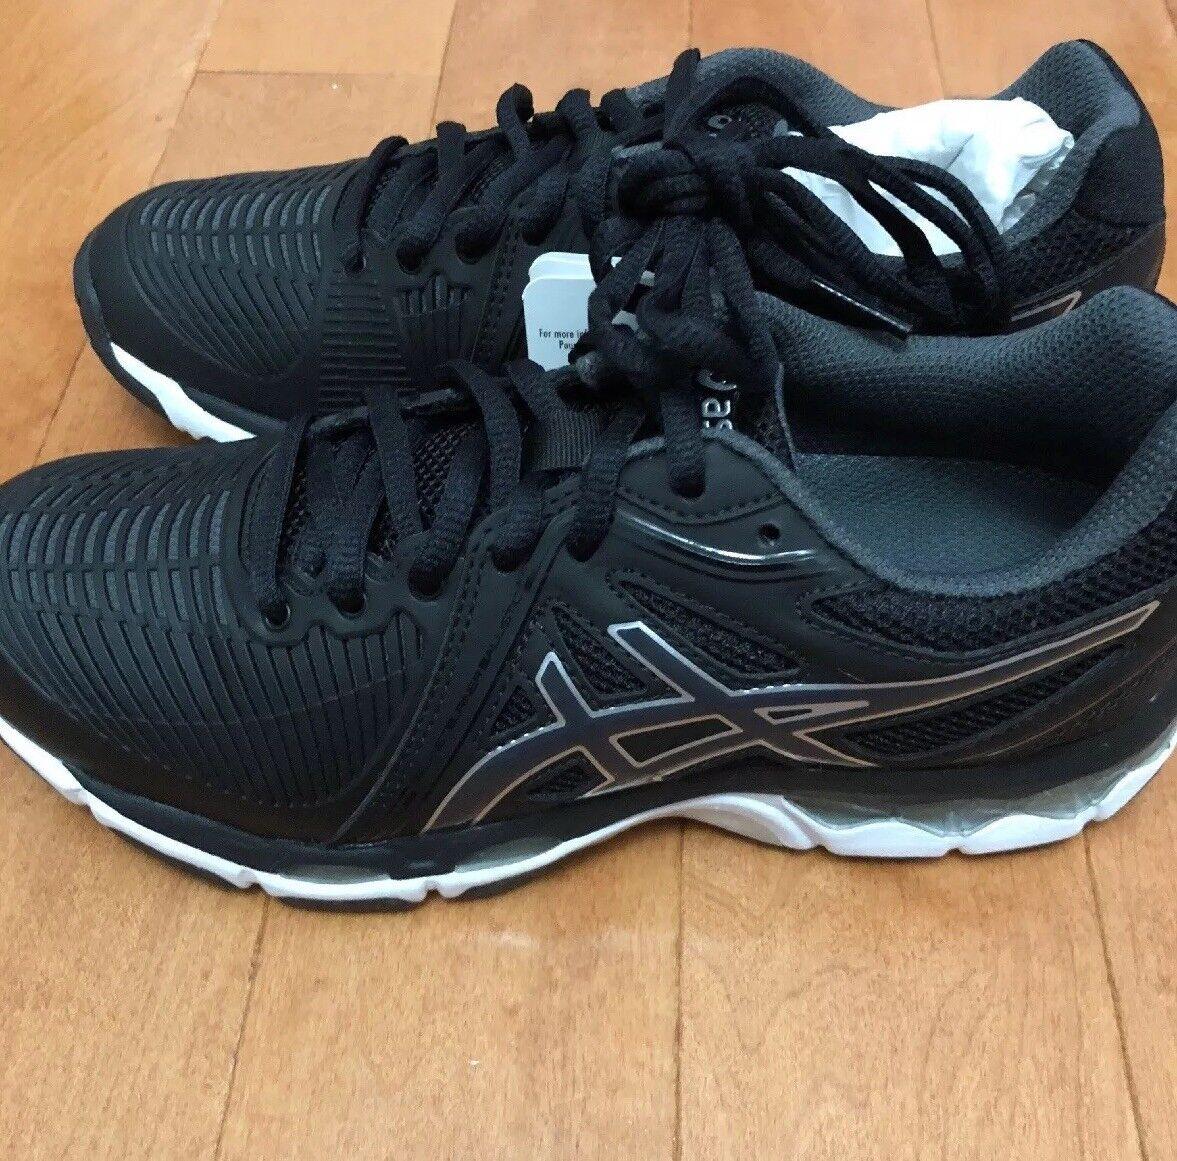 Nuevas ASICS Gel-Netburner balística para mujer voleibol Zapatos Negro gris M